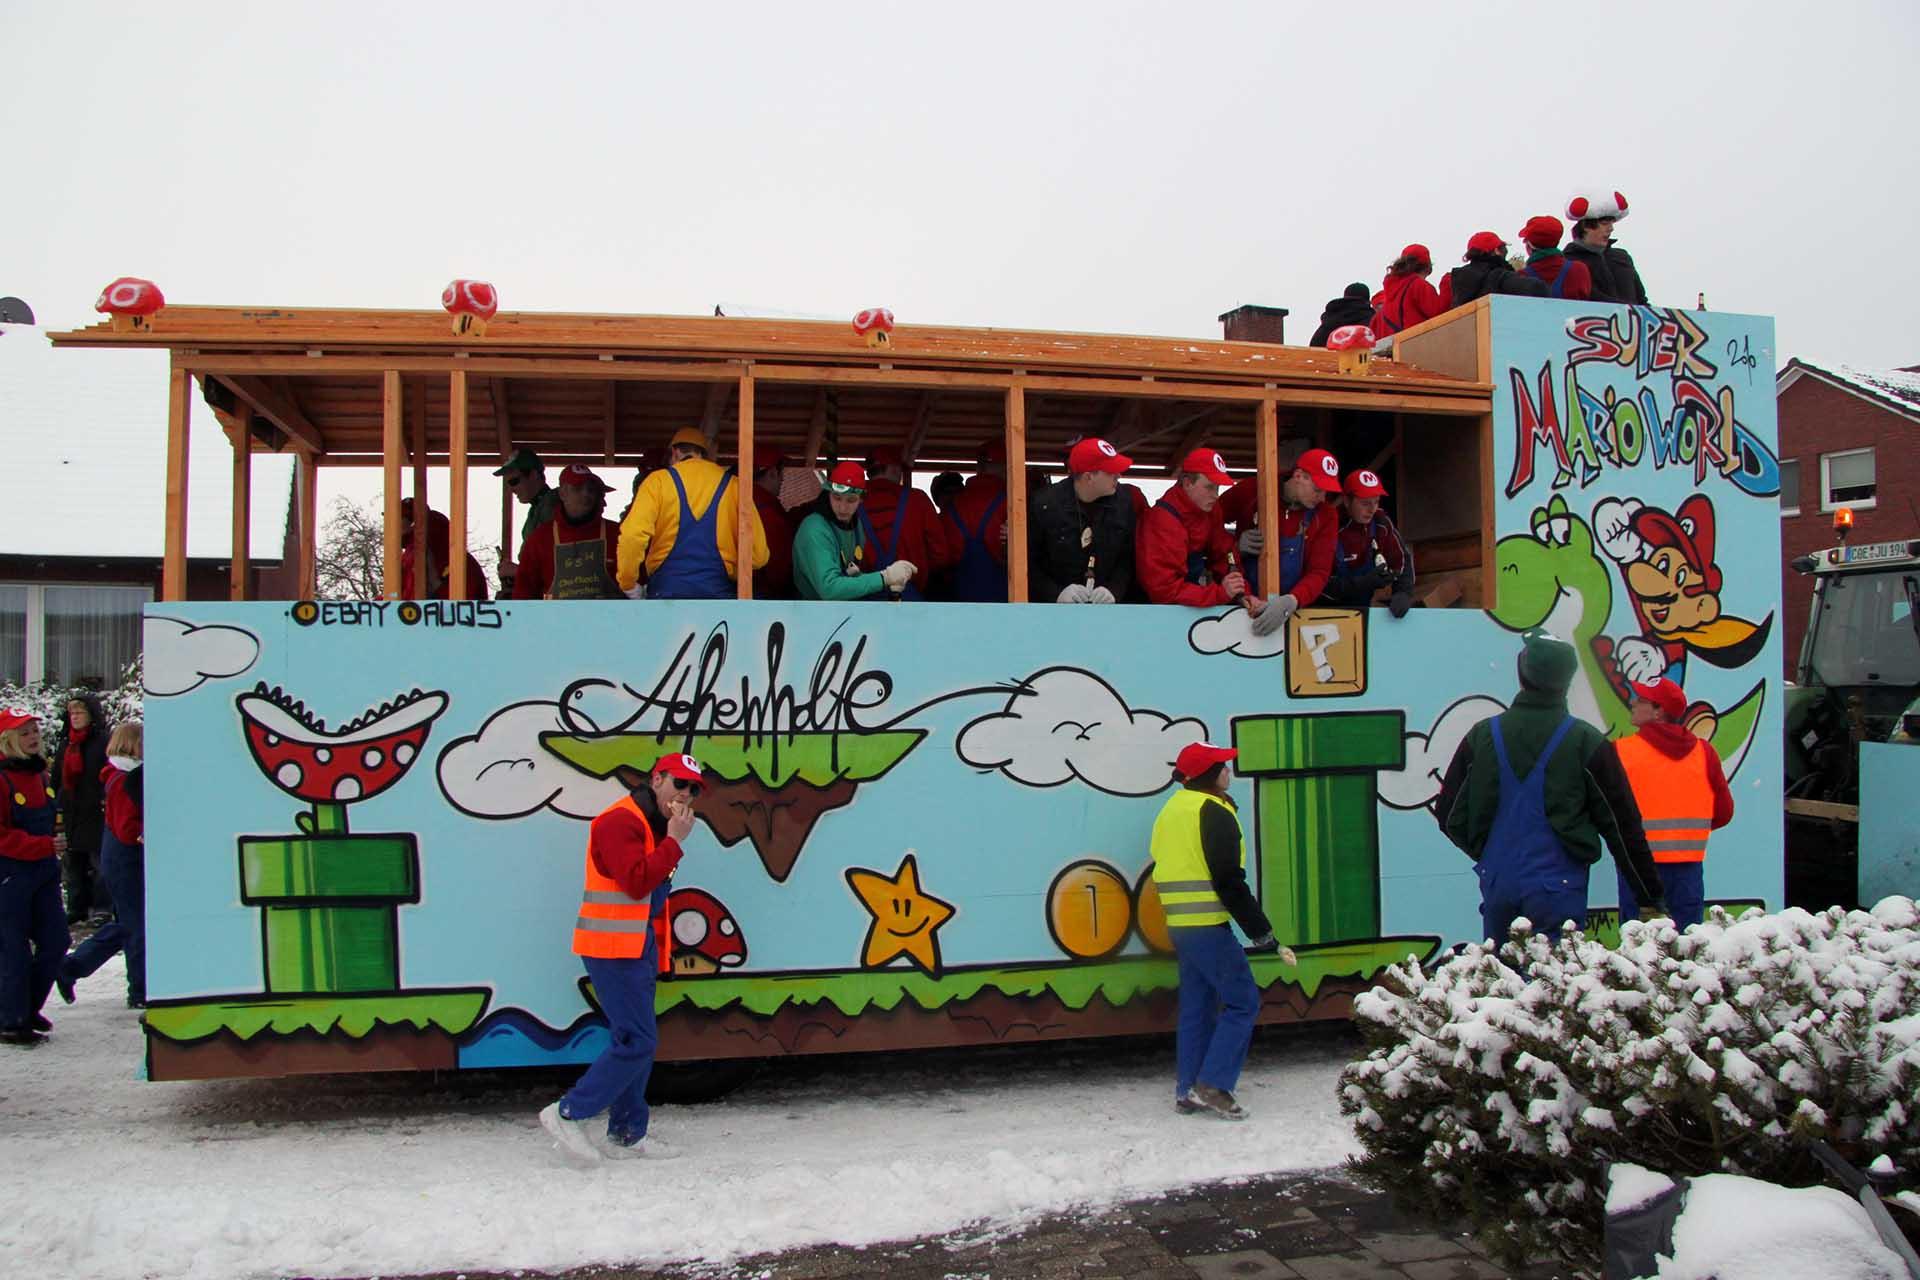 Karnevalswagen, Münster, Graffiti, Design, Kreativ, Motive, Bennet Grüttner, Umzug, Farbe, Bunt